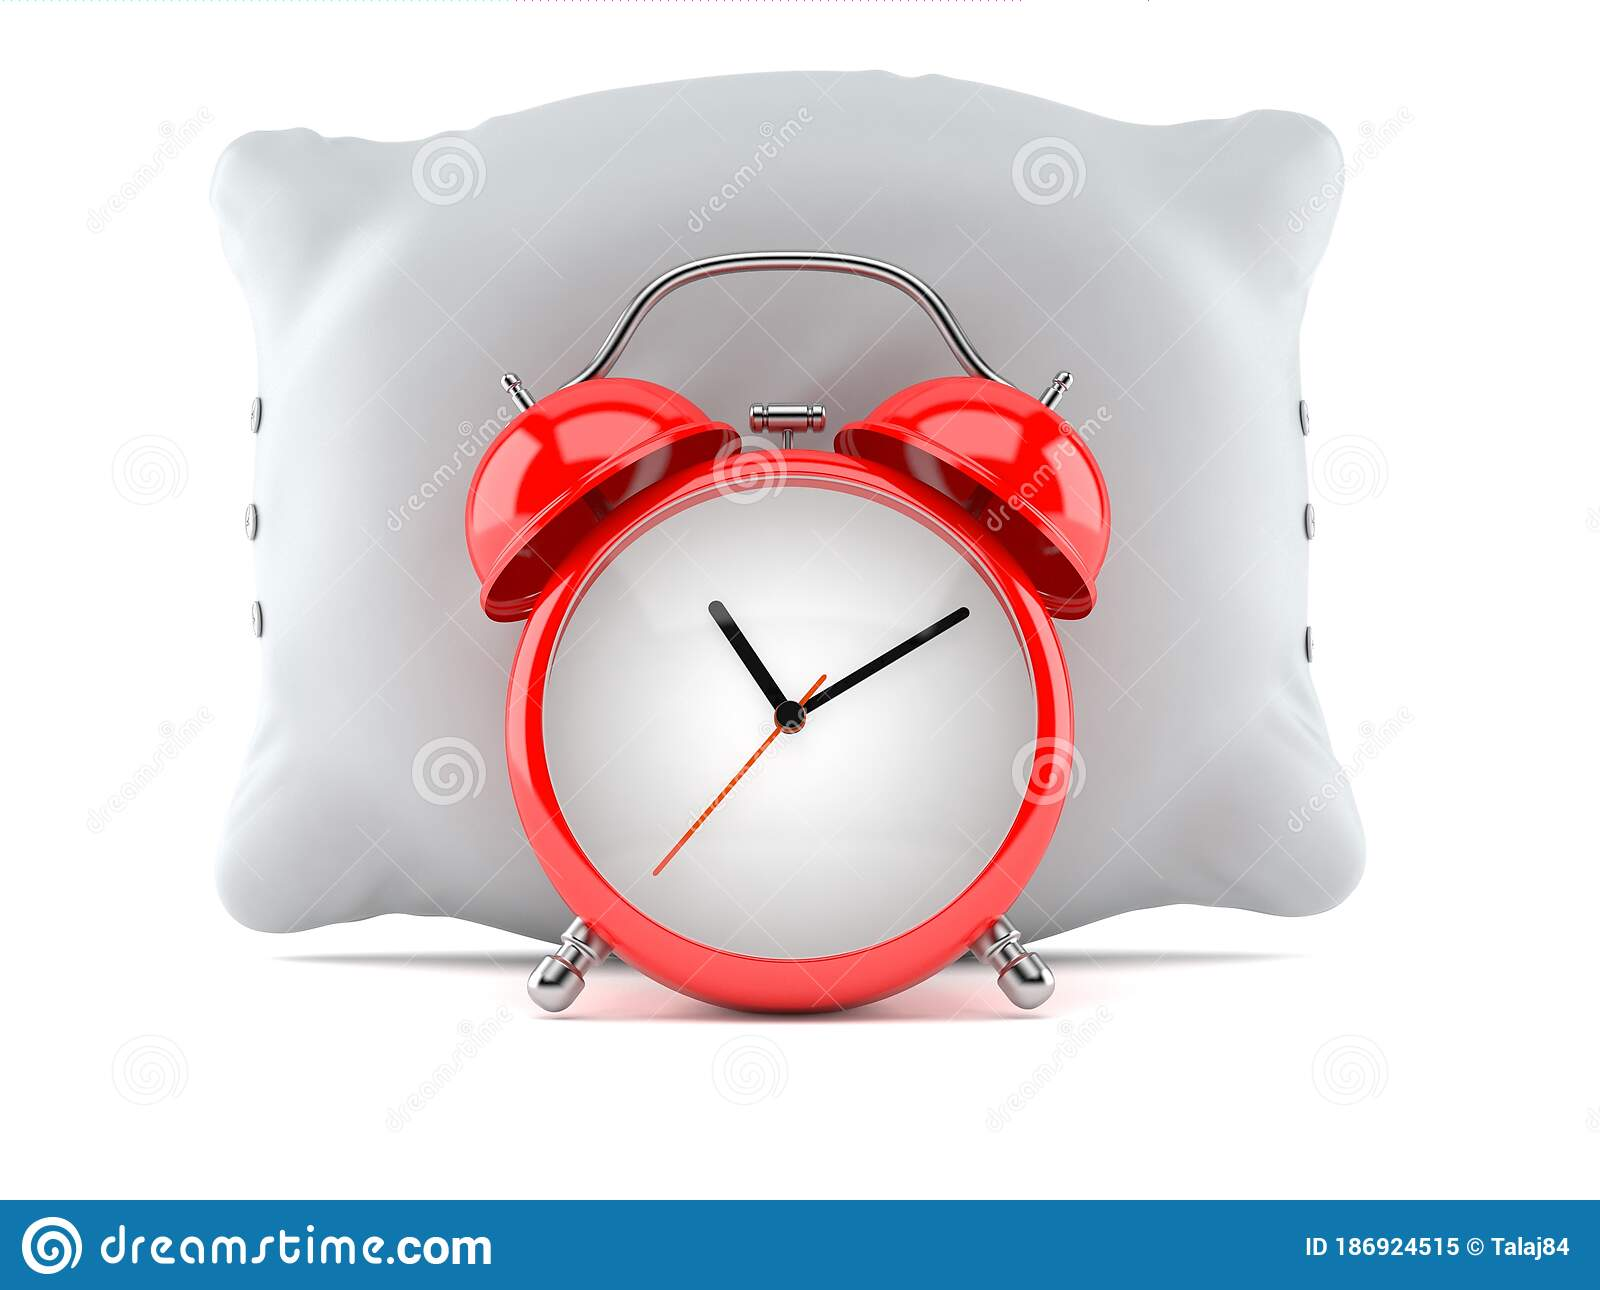 pillow with alarm clock stock illustration illustration of laze 186924515